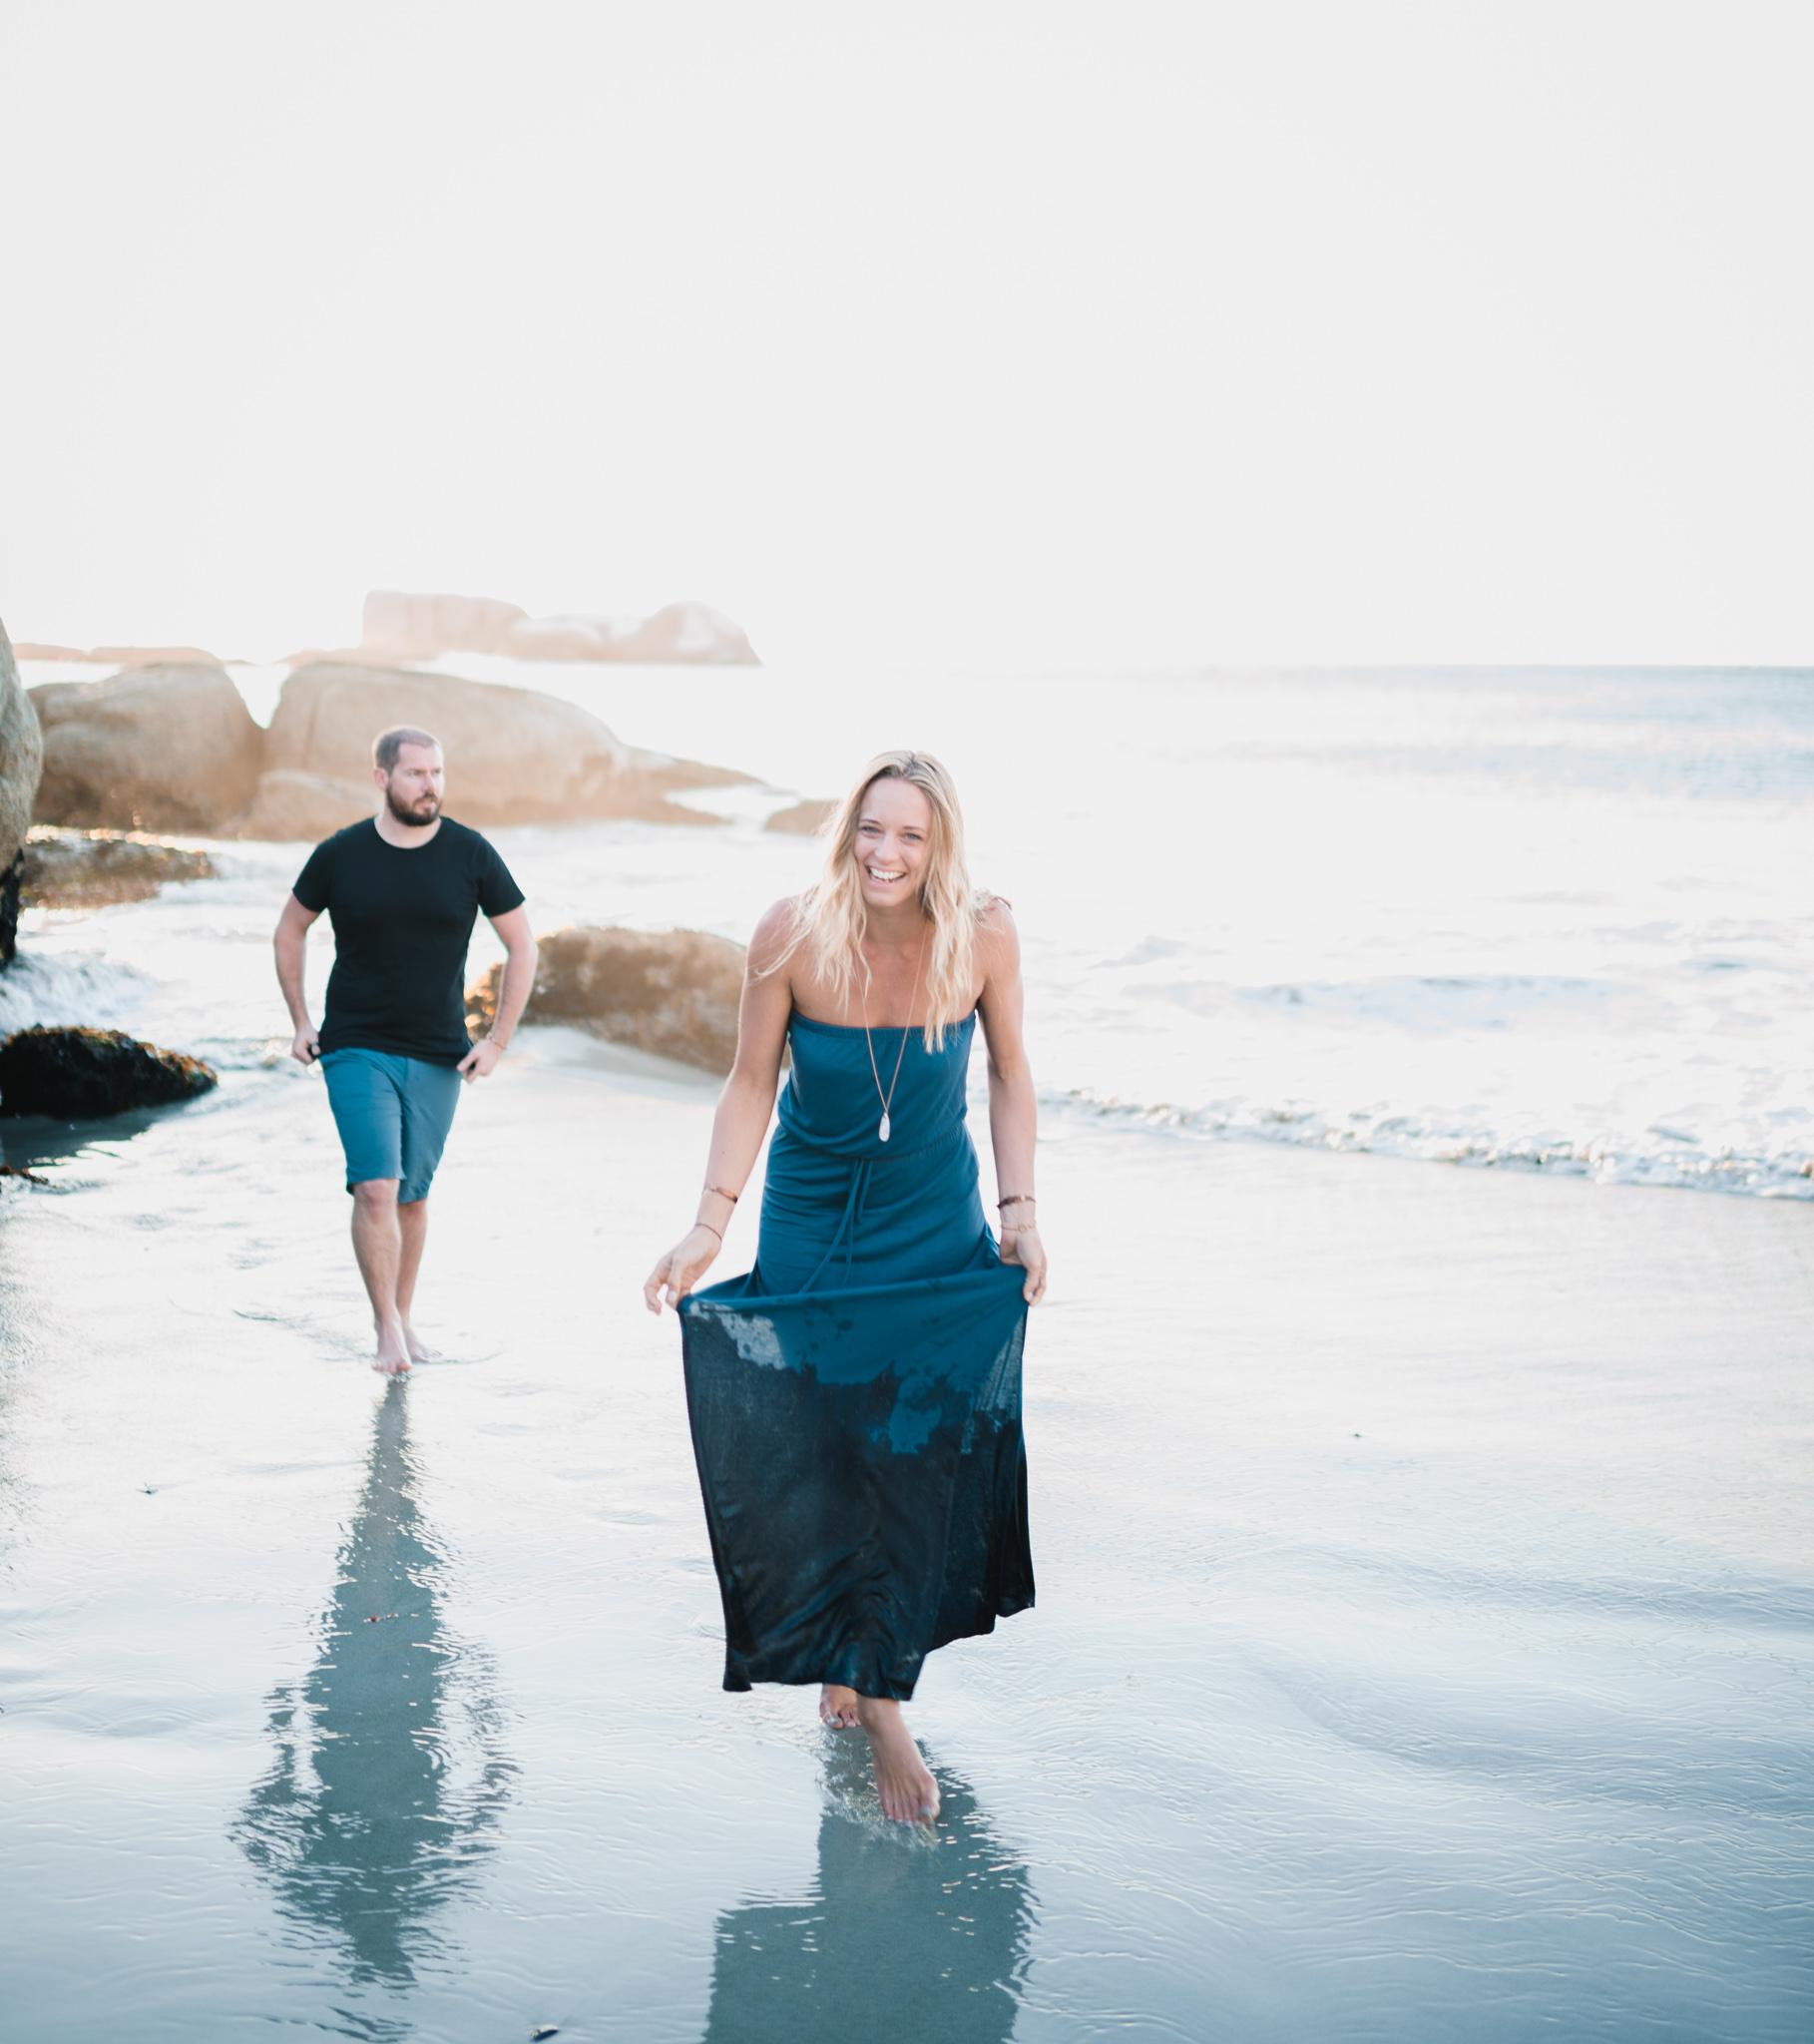 Ross & Candice engagement (36 of 166).JPG